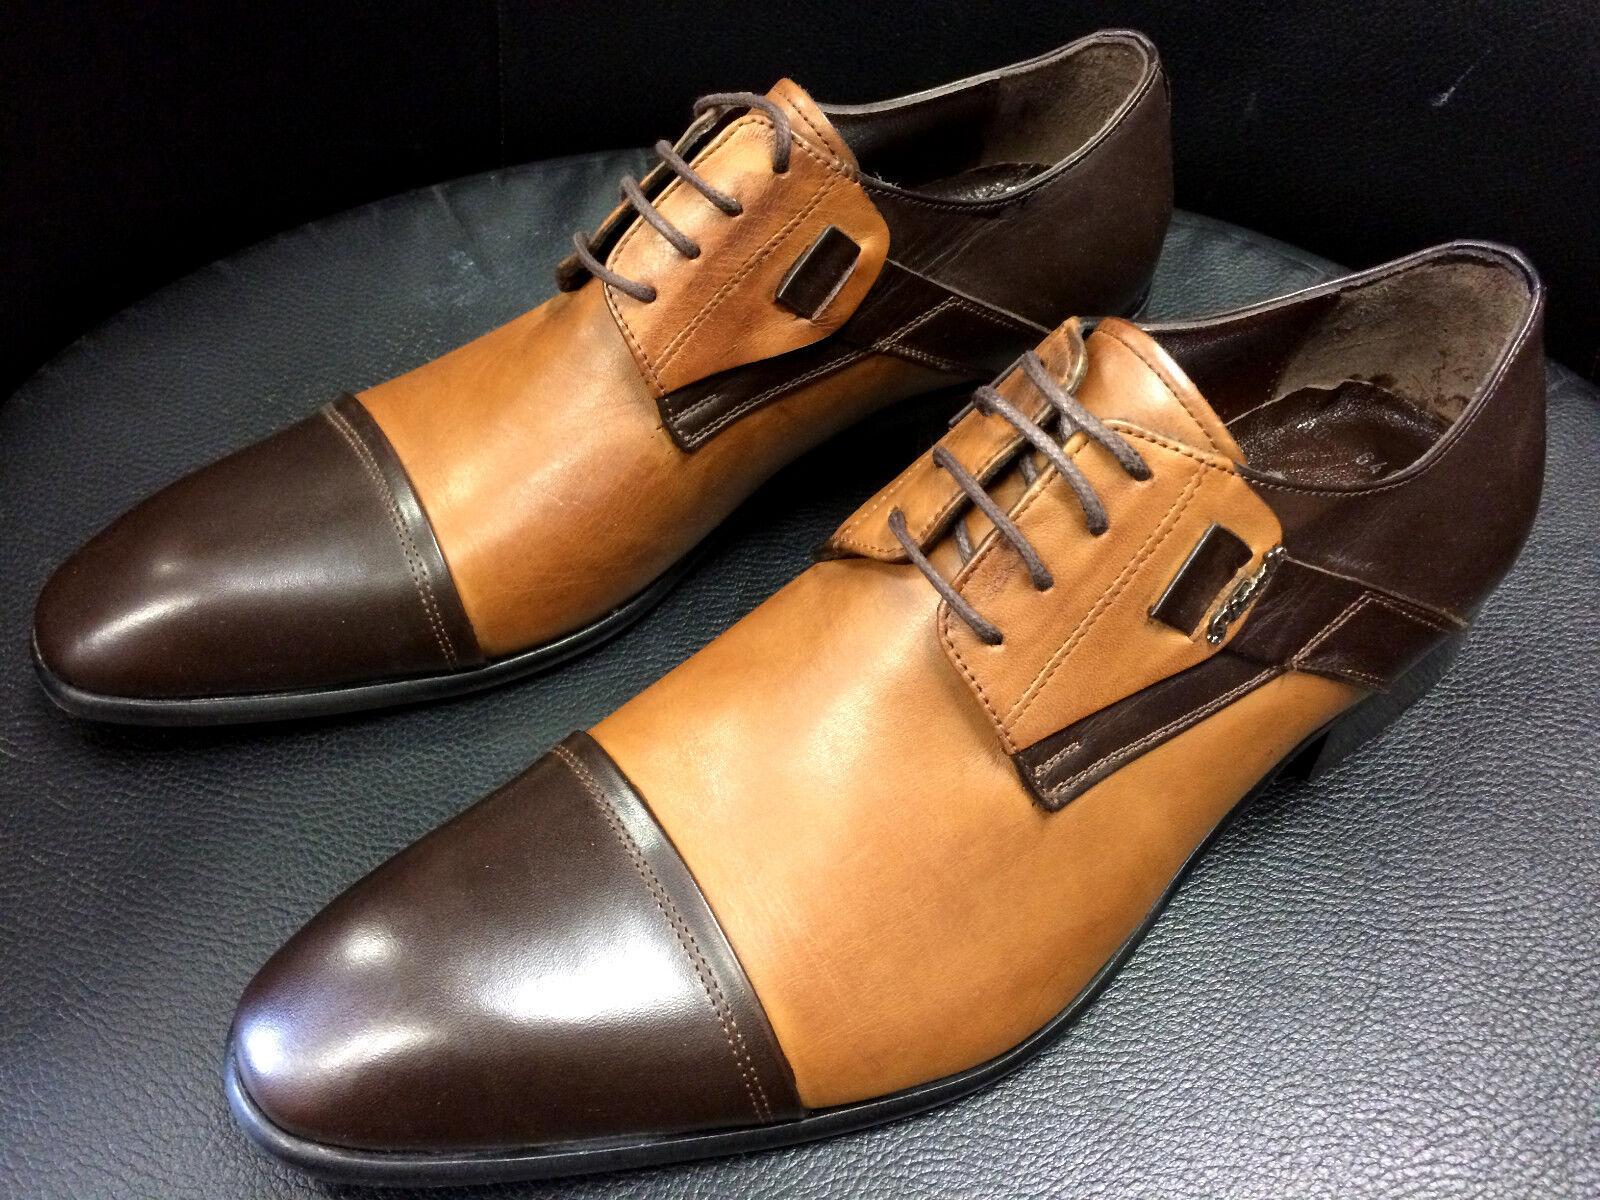 Pablo Picasso zapatos italiano Designer Slipper Handmade marrón claro Business